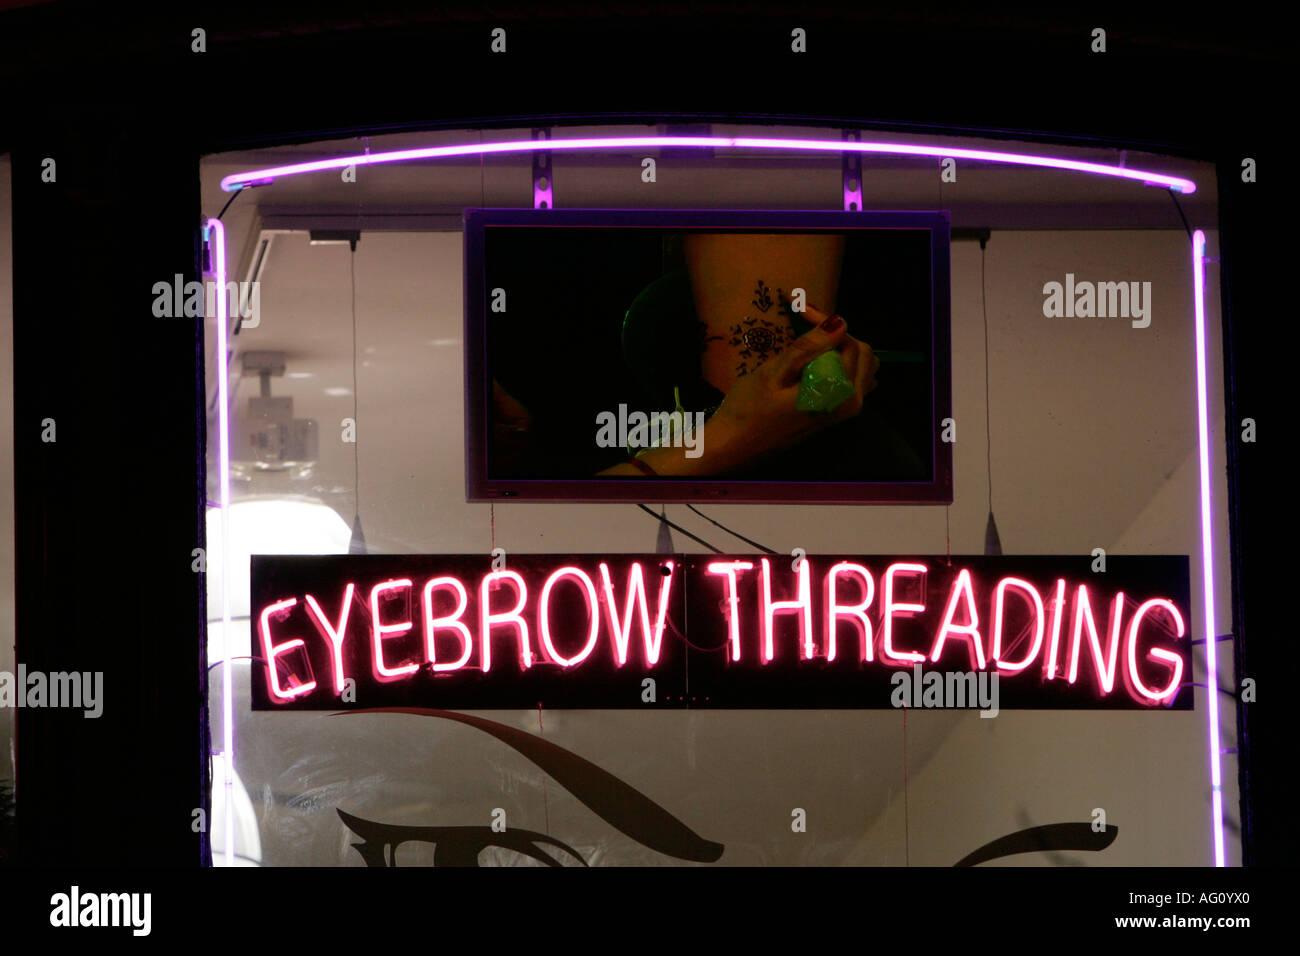 Eyebrow Threading Stock Photos Eyebrow Threading Stock Images Alamy